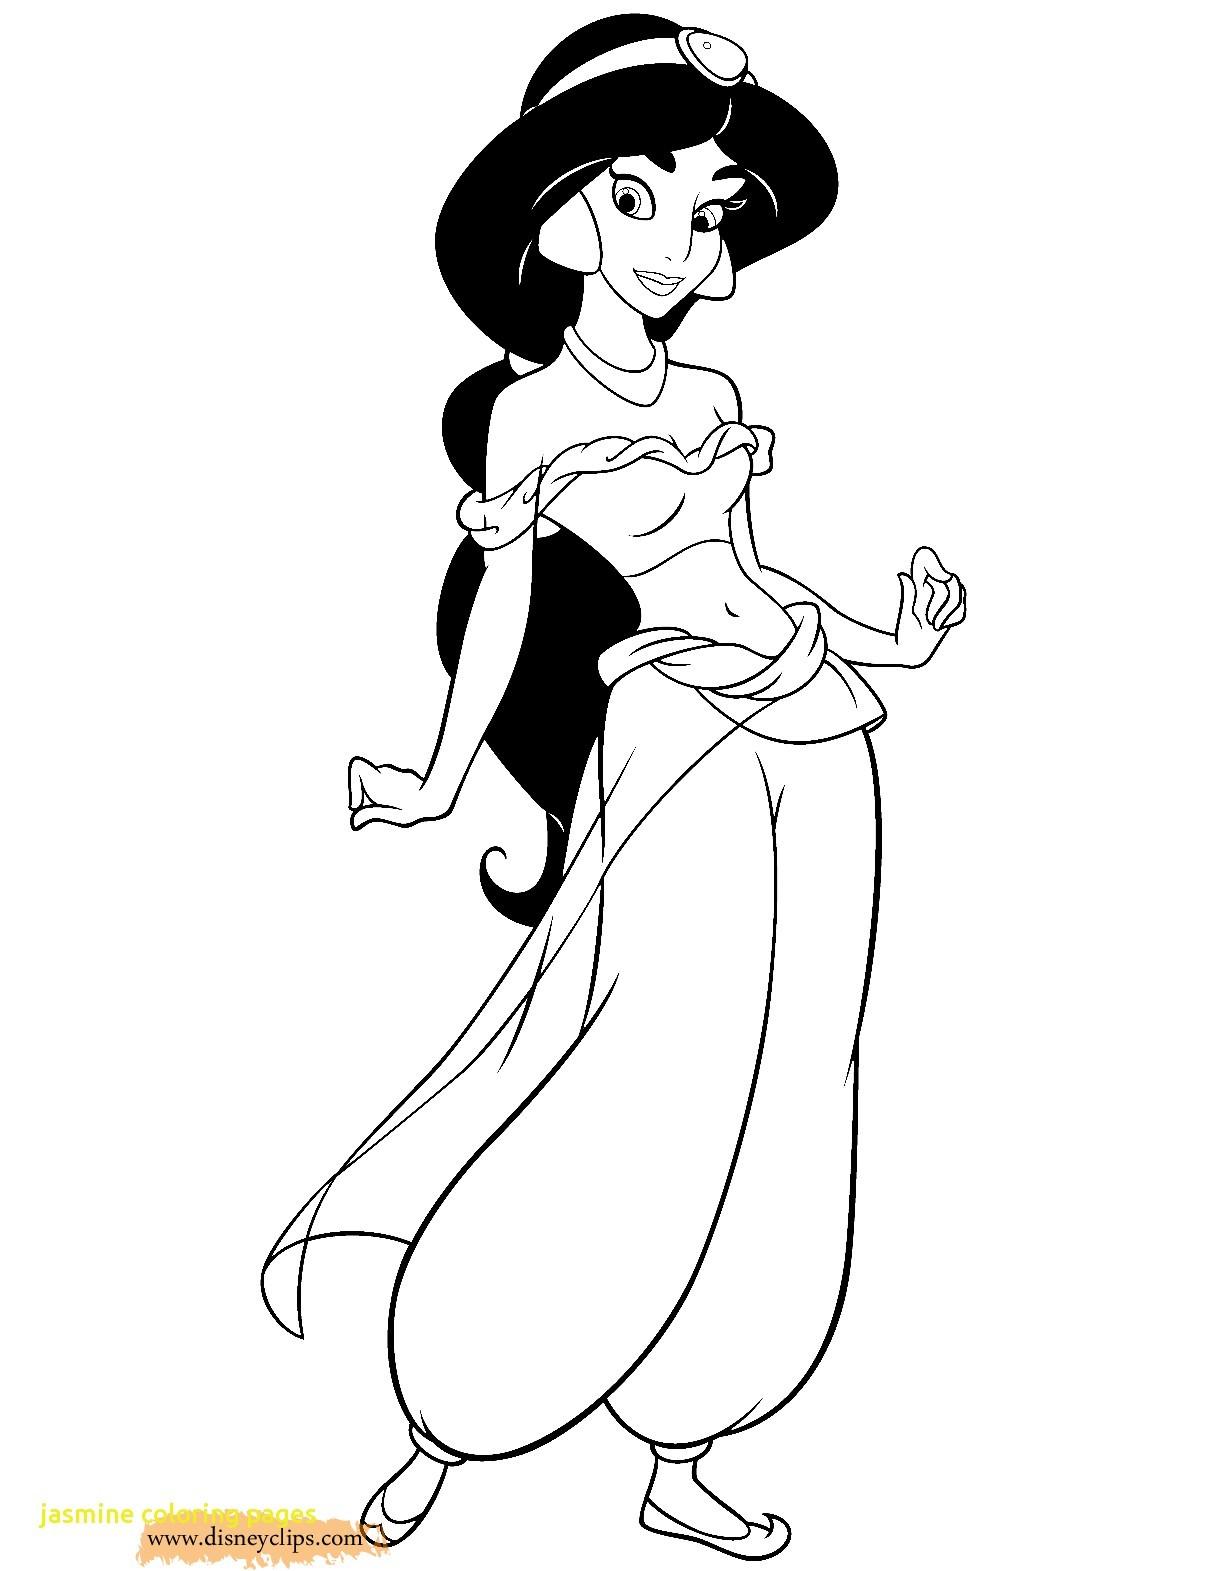 1229x1571 Fresh Jasmine And Aladdin Coloring Pages Free Copy Jasmine